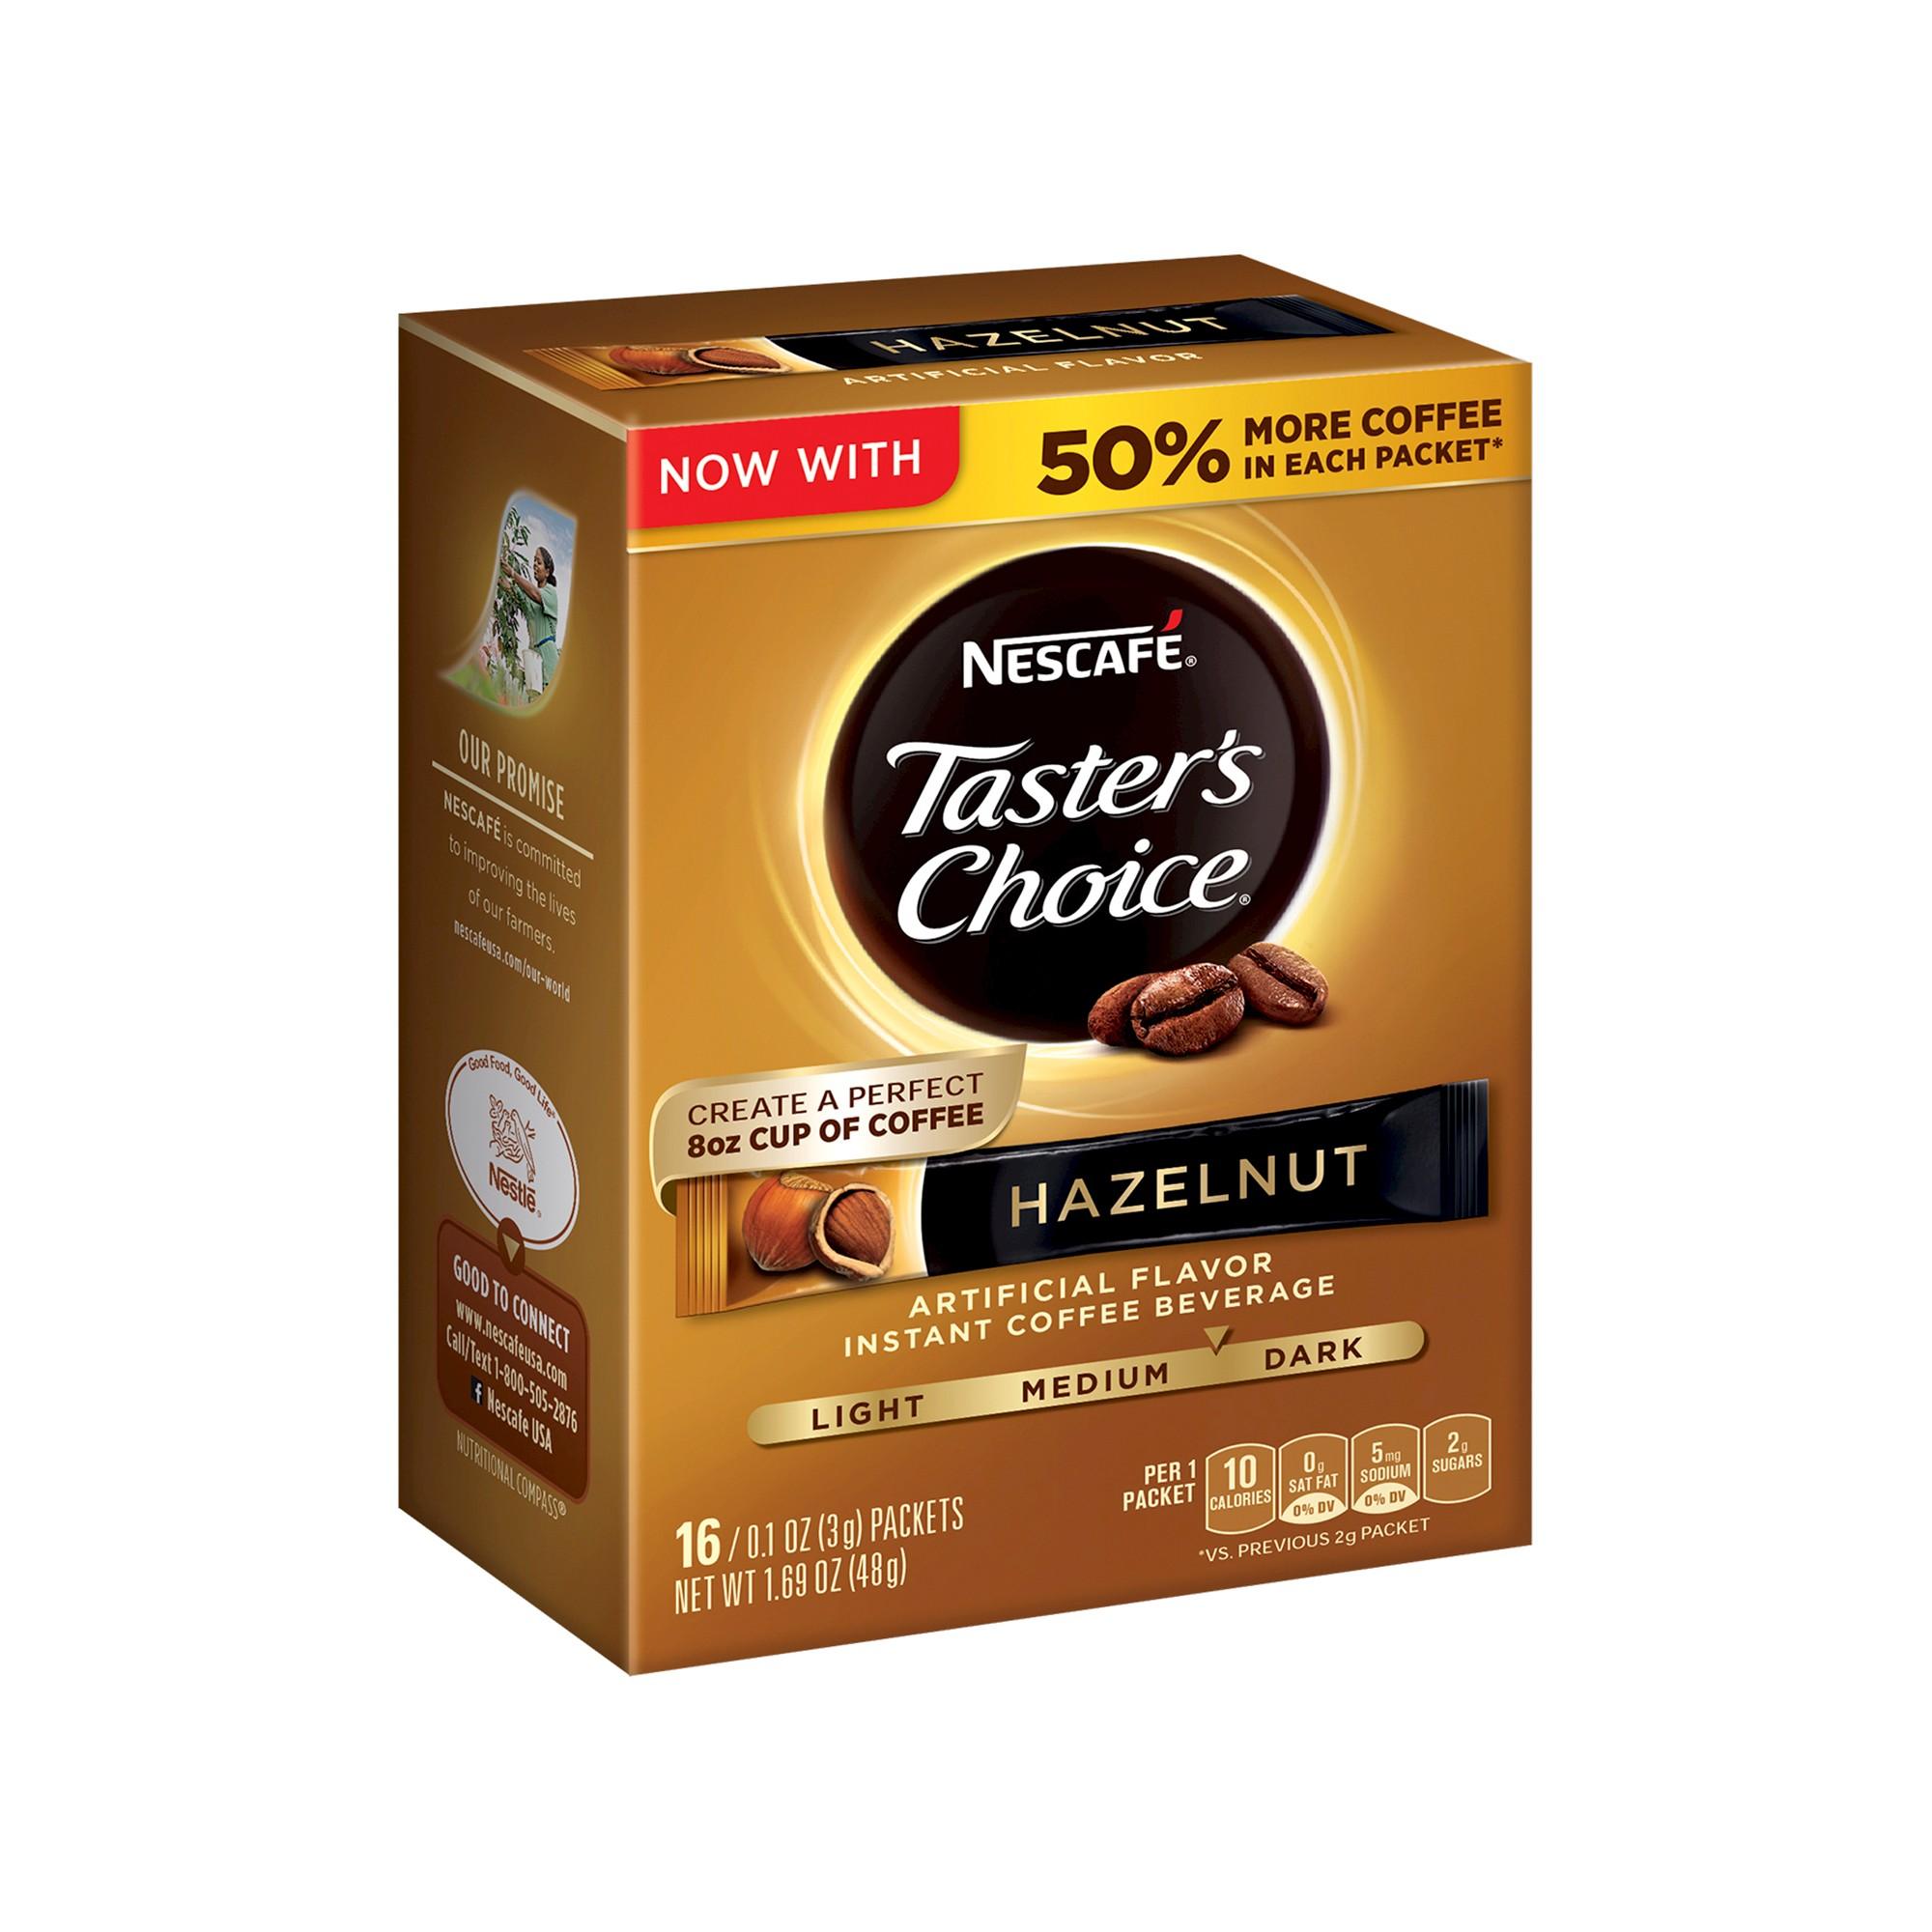 Nescafé Taster's Choice Hazelnut Gourmet Dark Roast